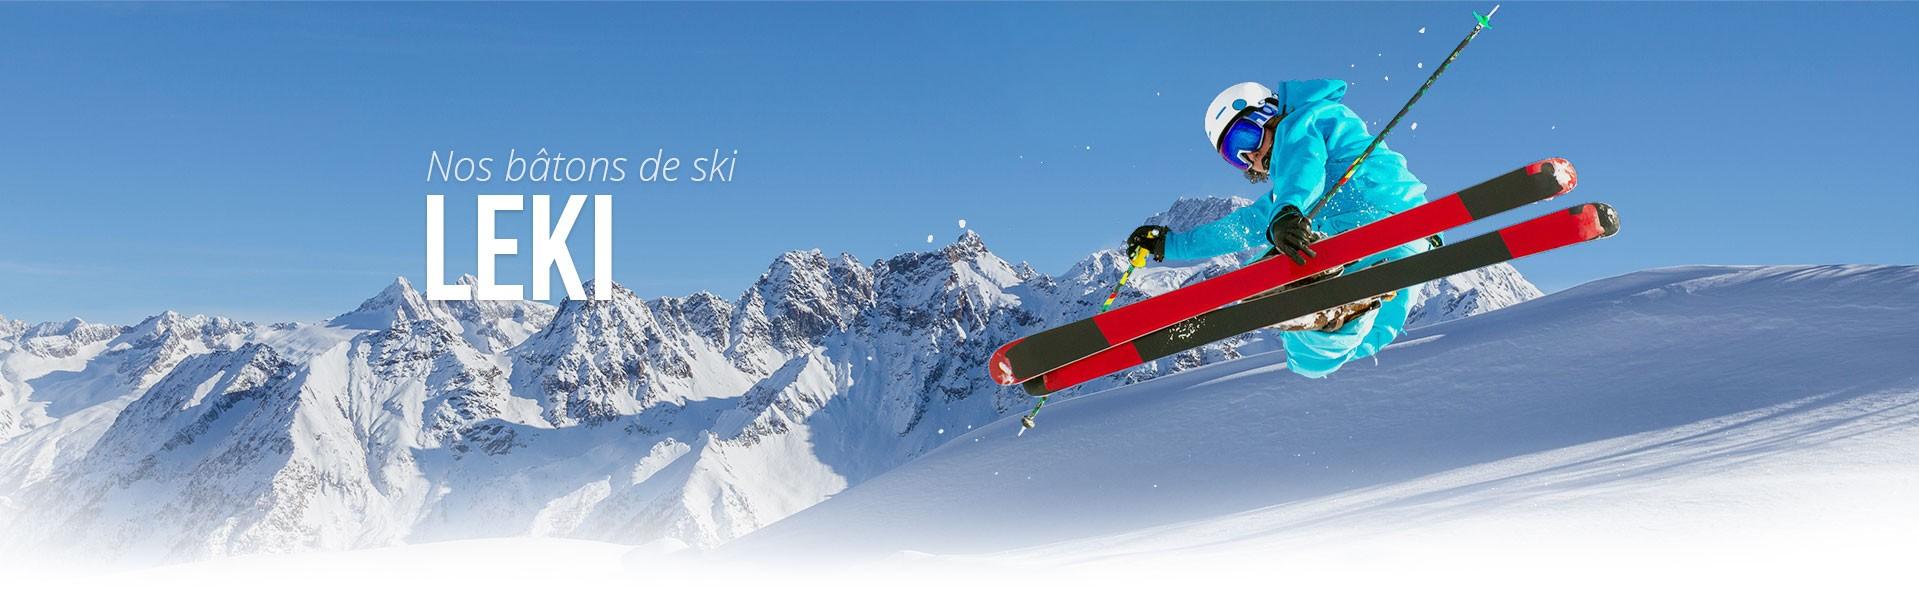 Bâtons de ski Racing Léki